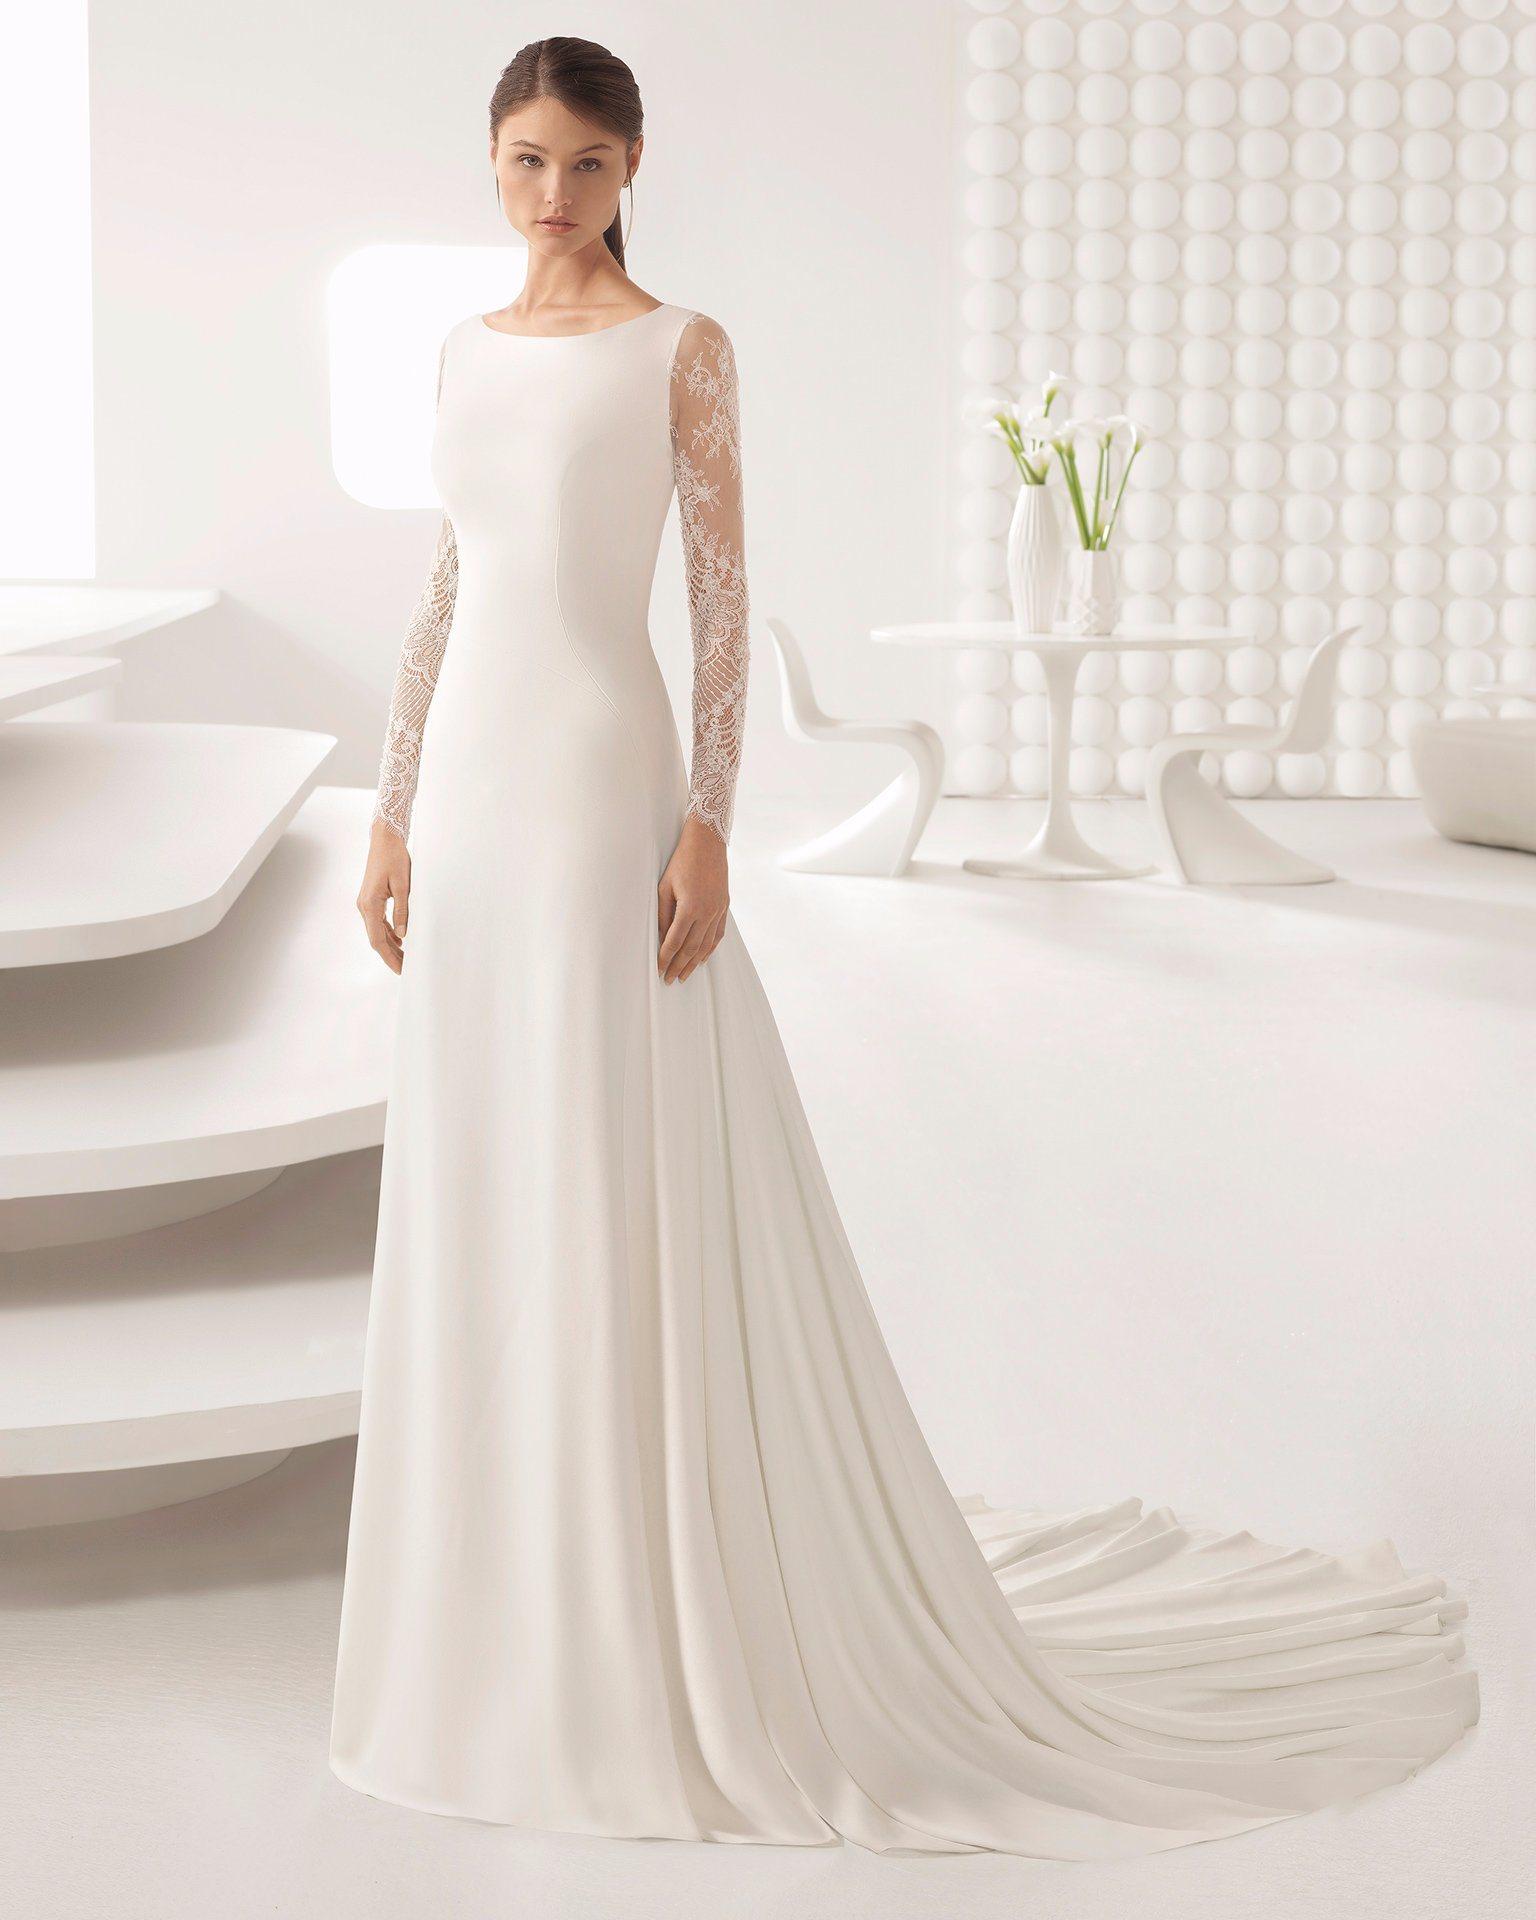 Boat Neck Lace Long Sleeve Chiffon Bridal Wedding Dress